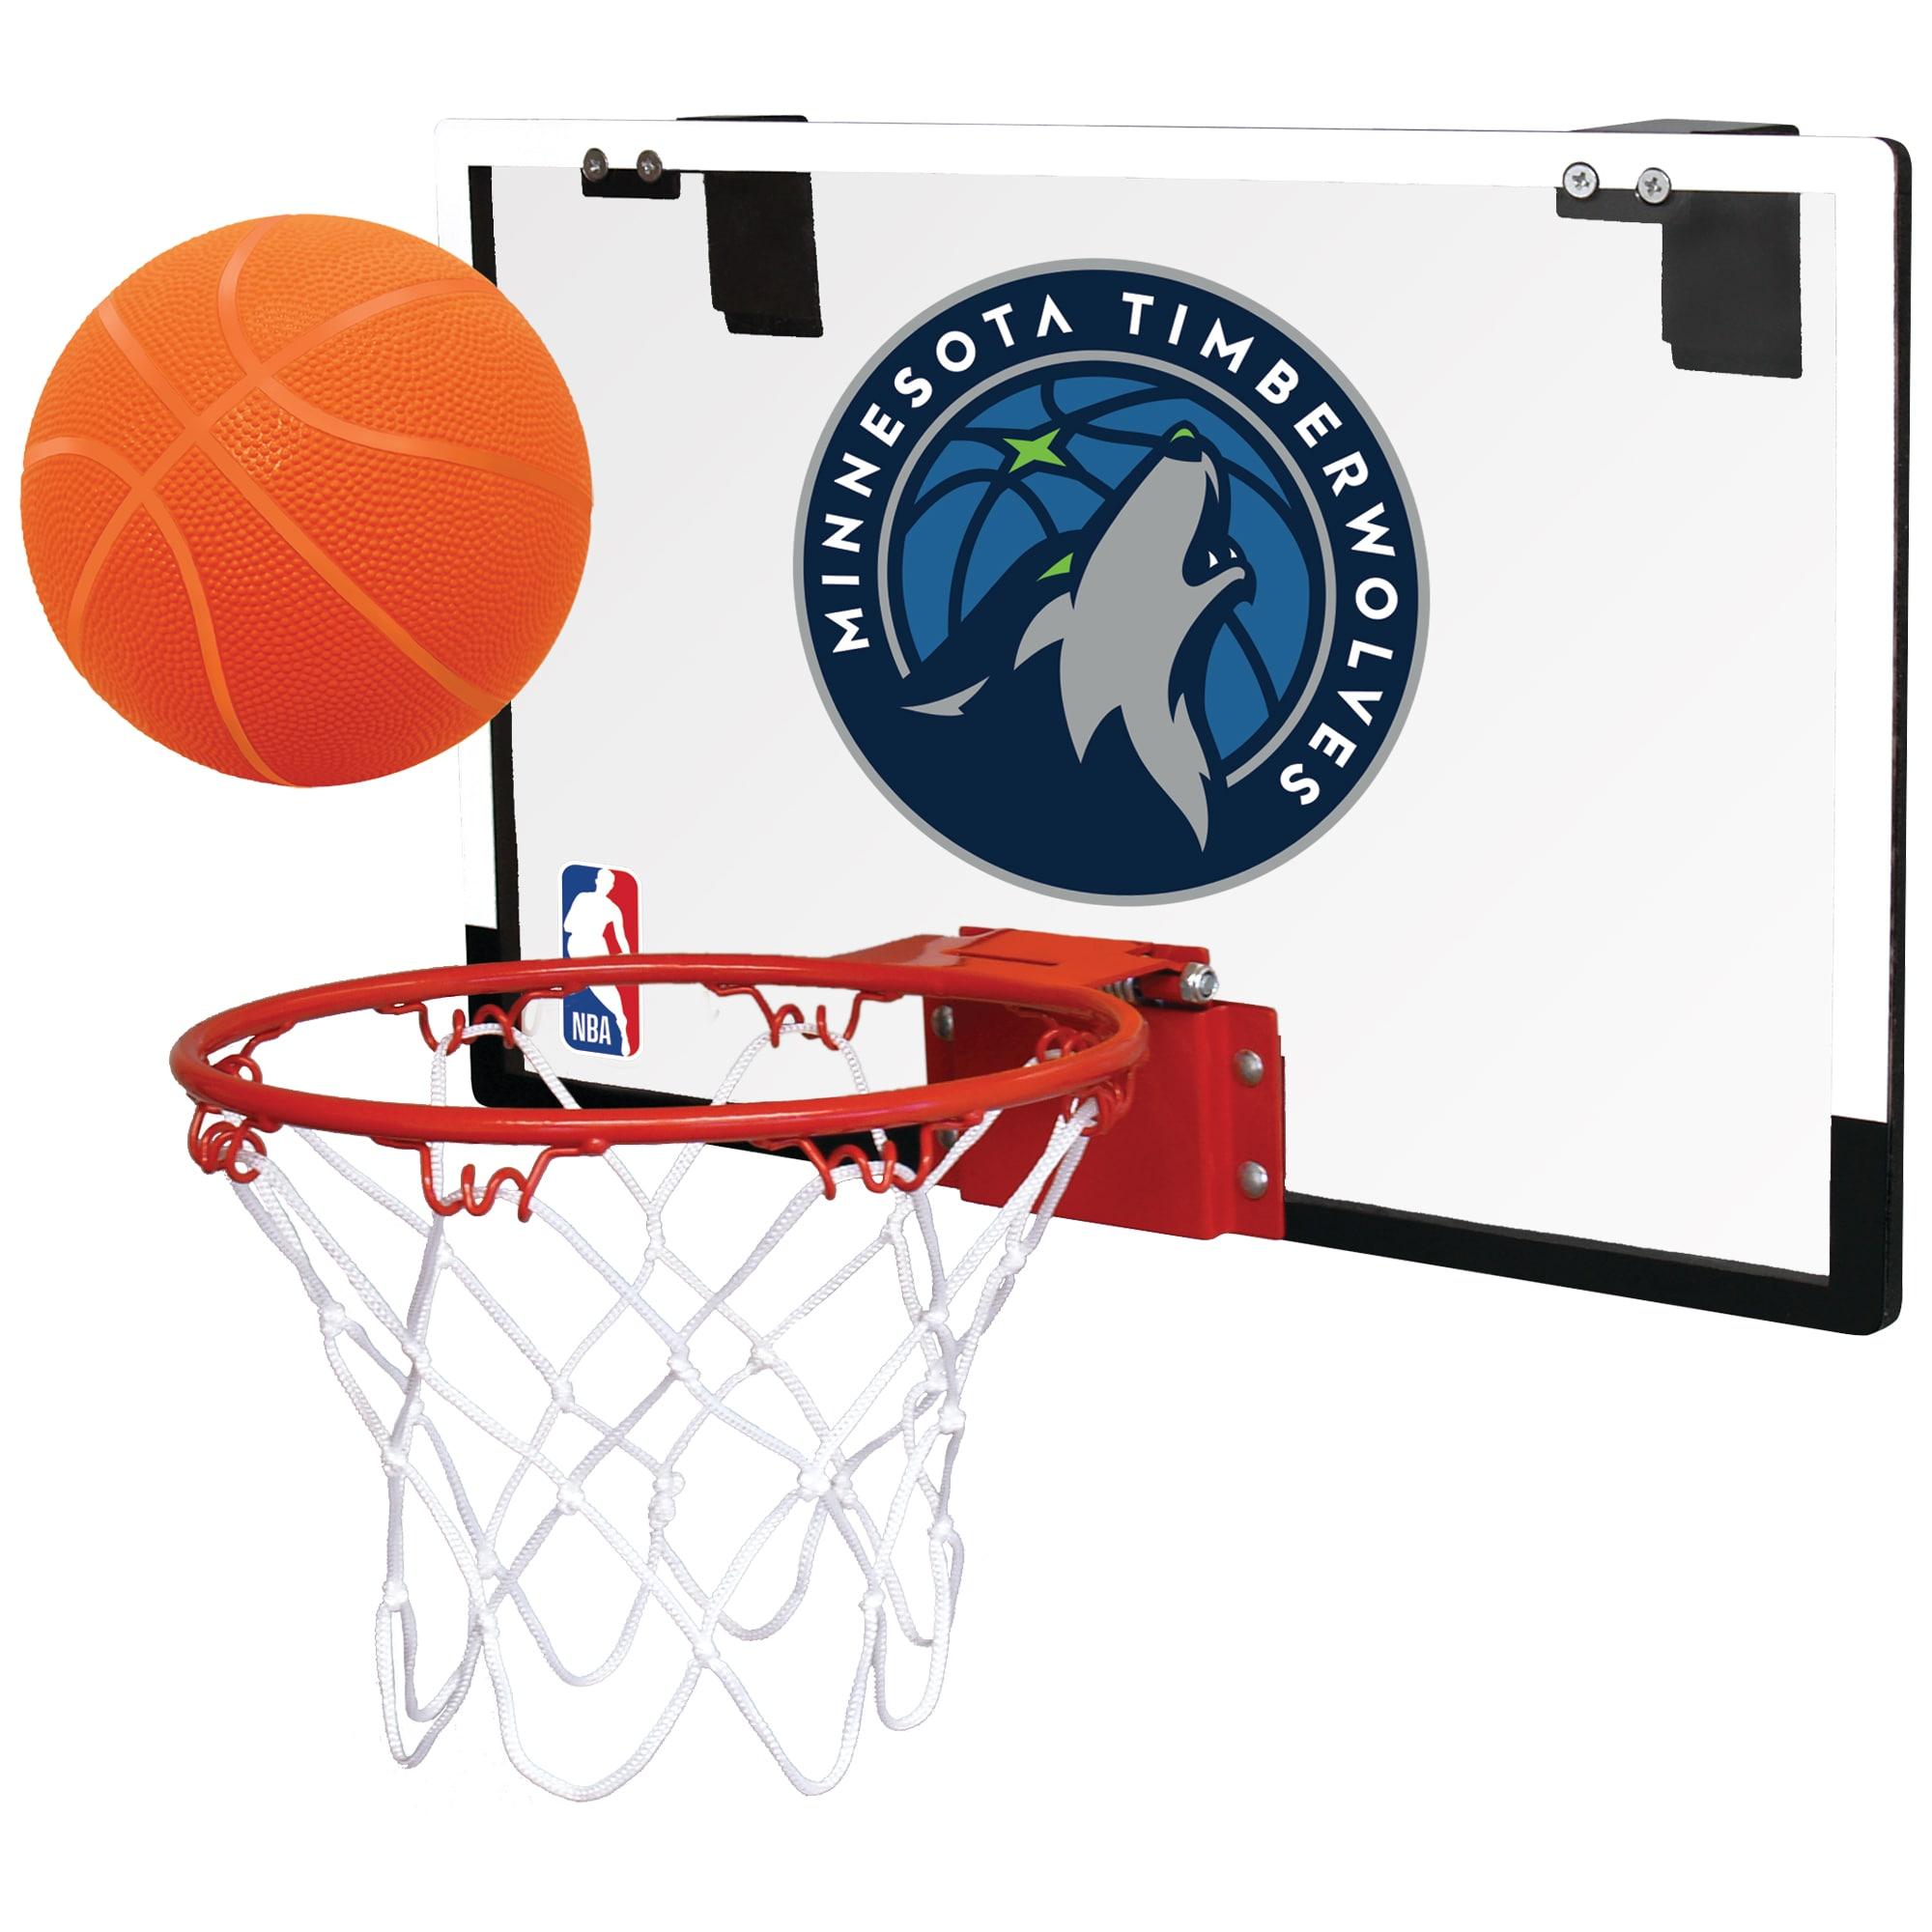 Minnesota Timberwolves Rawlings NBA Polycarbonate Hoop Set